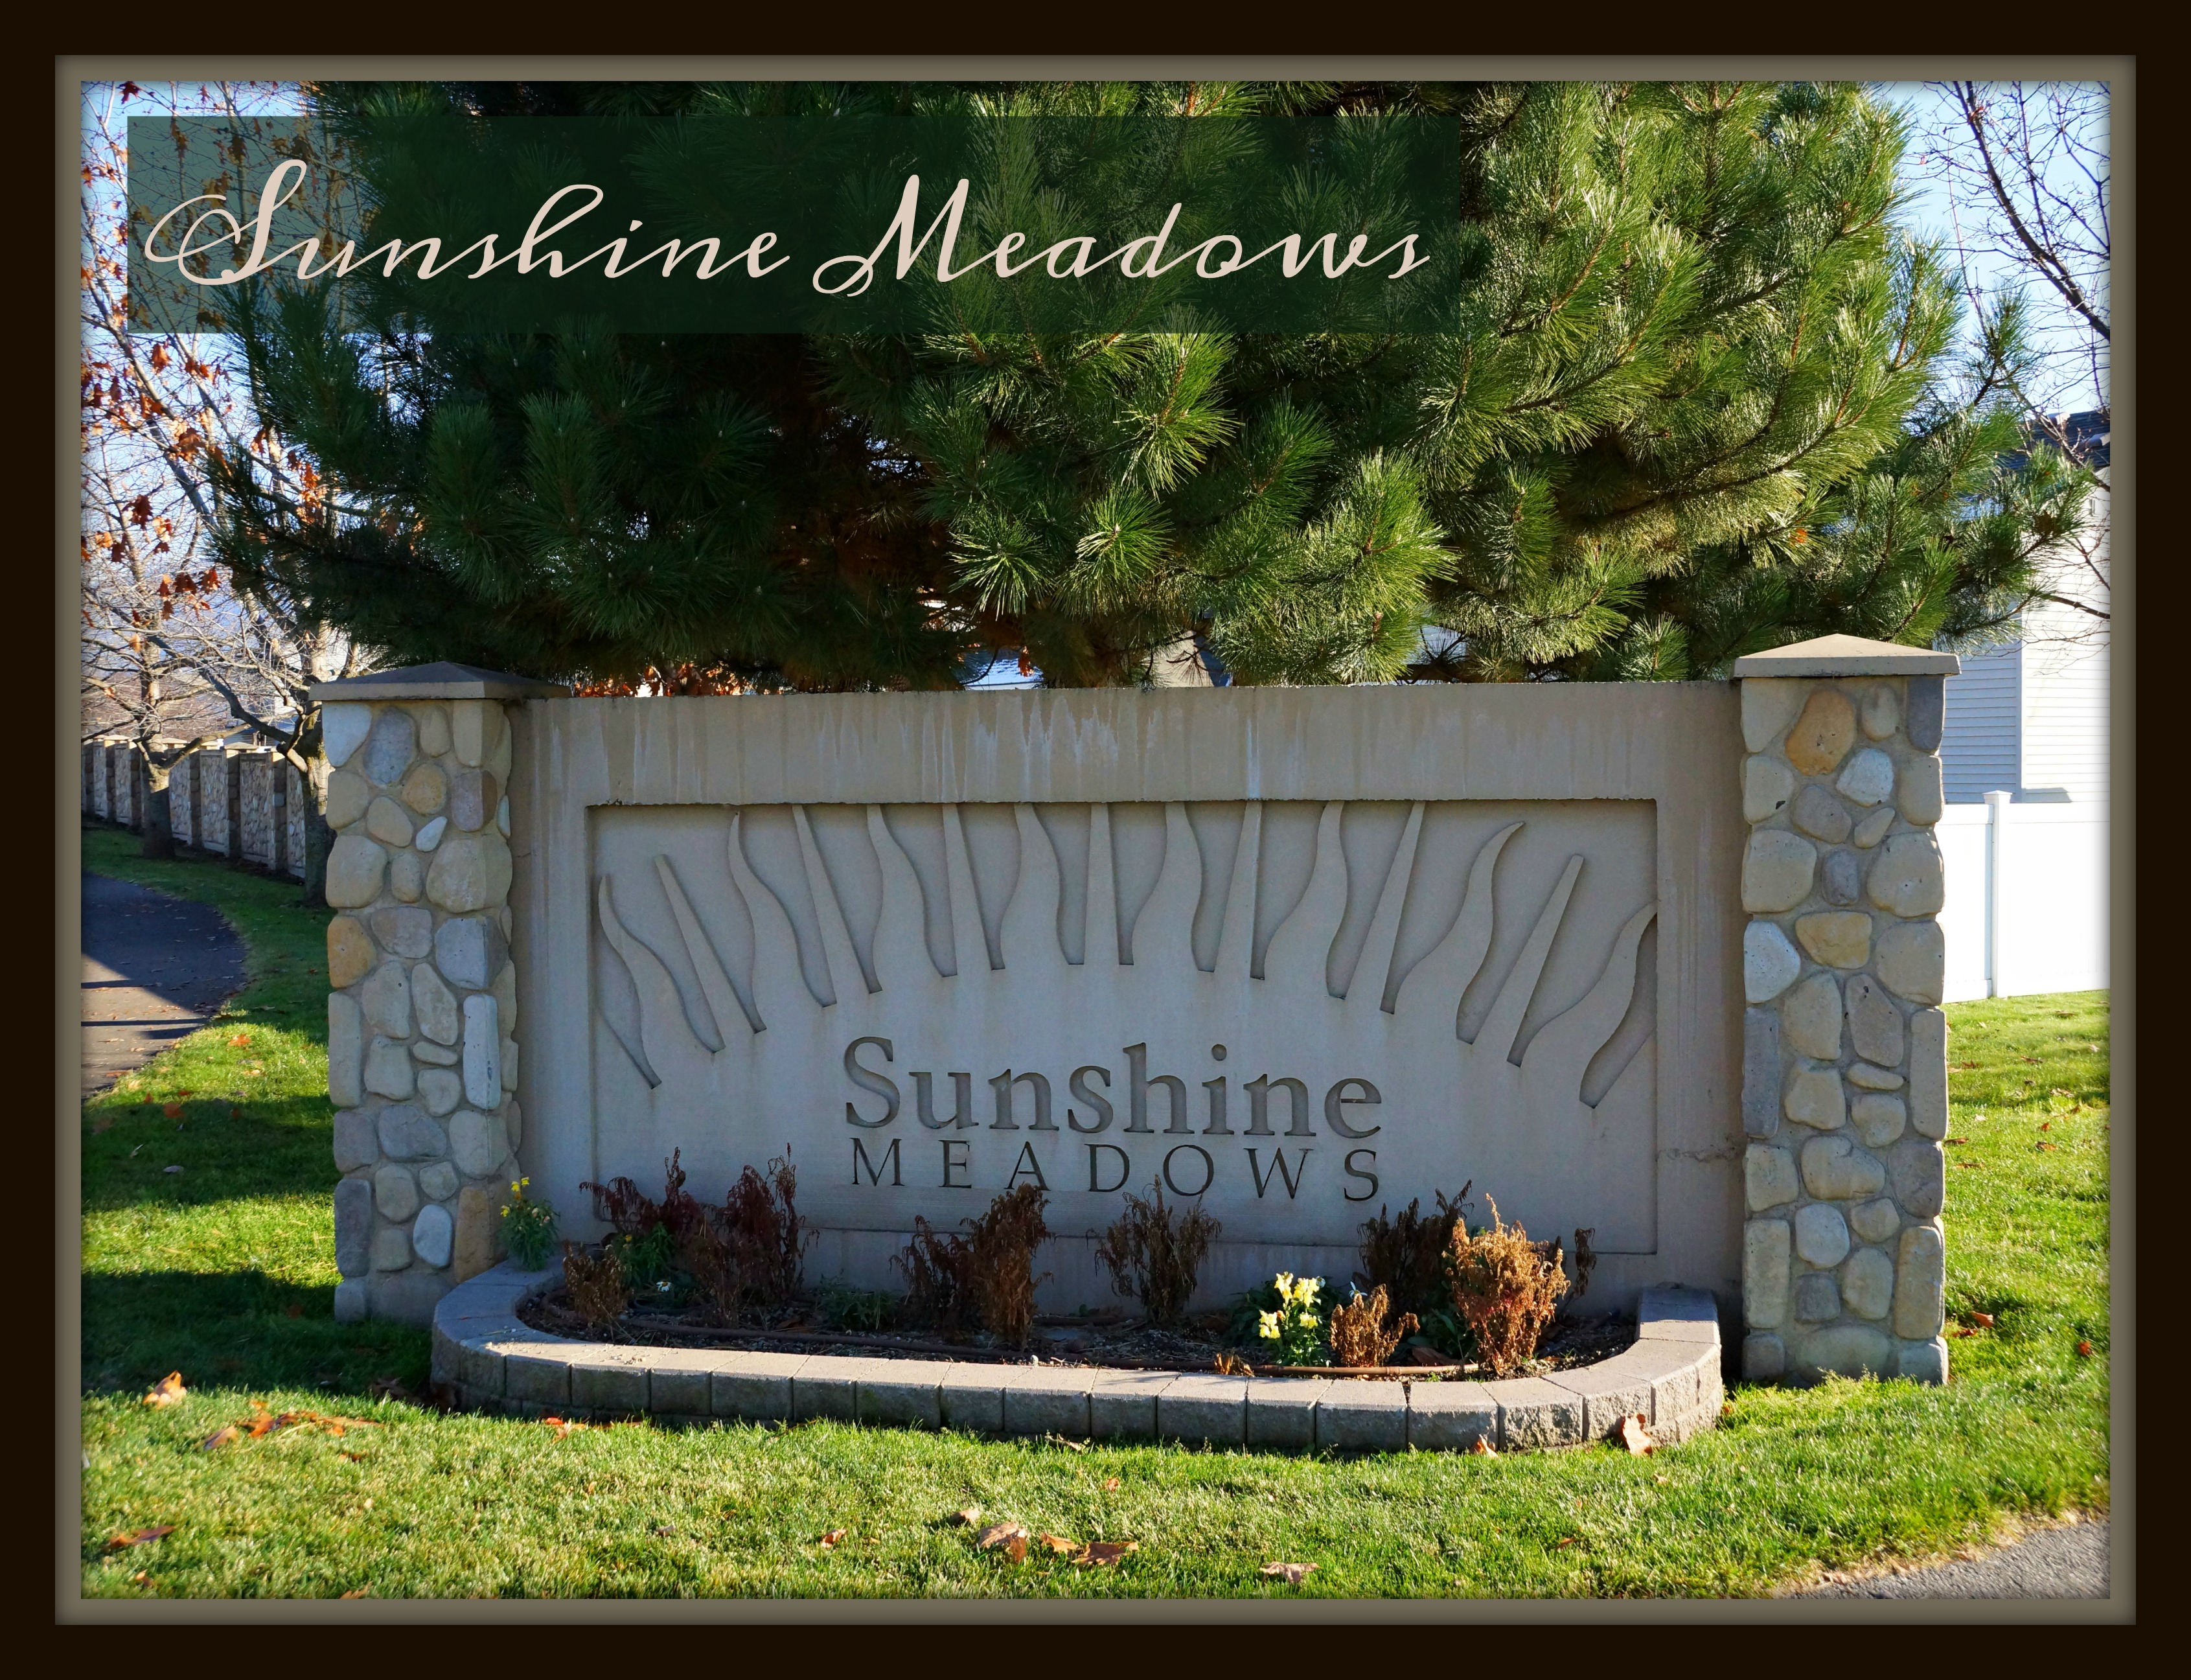 where is sunshine meadows